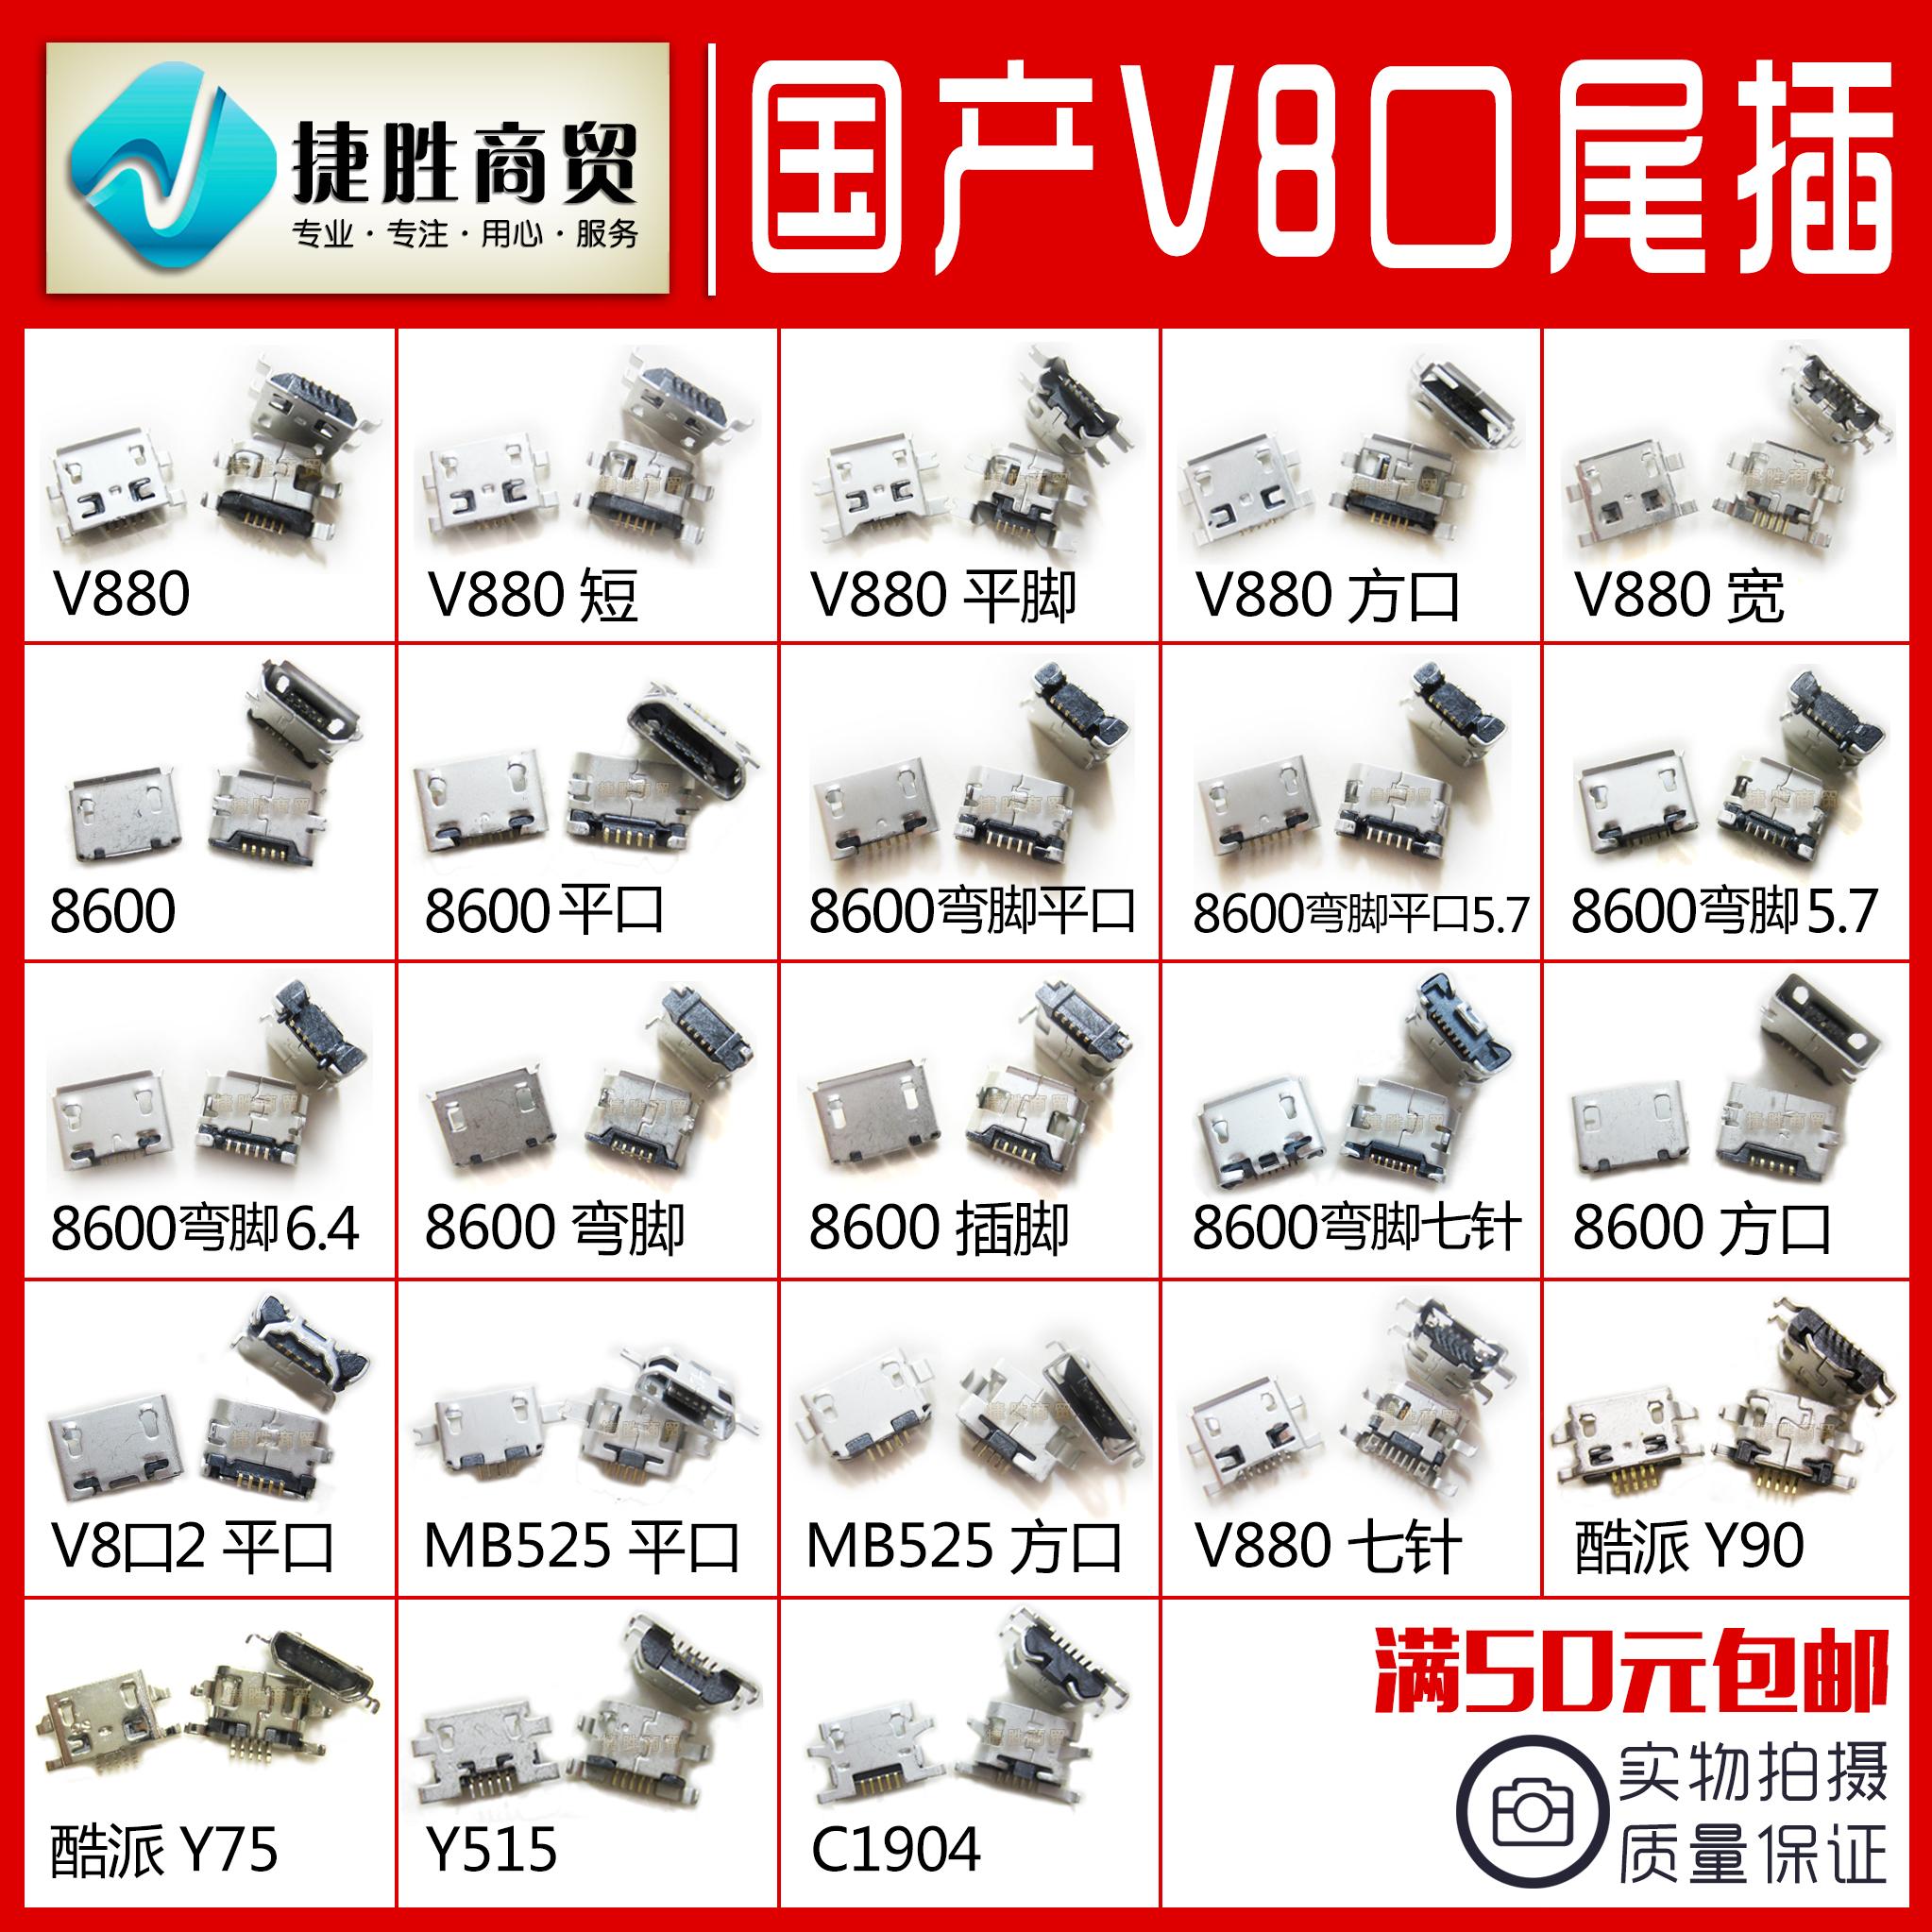 Сделано в китае V8 рот заглушка смартфон машинально заглушка общий заглушка общий USB зарядка заглушка интерфейс